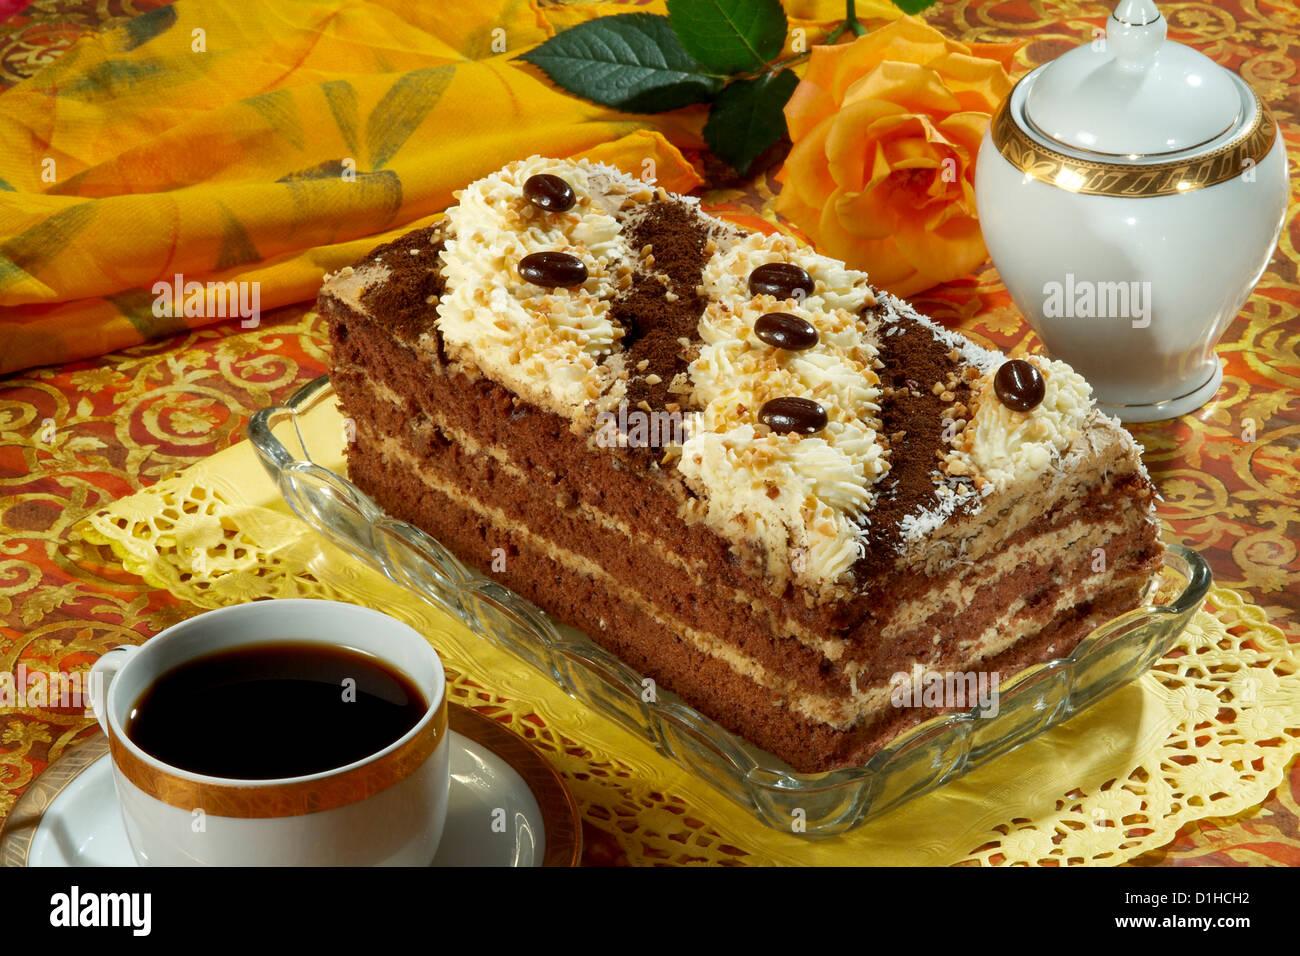 Chocolate cake - Stock Image